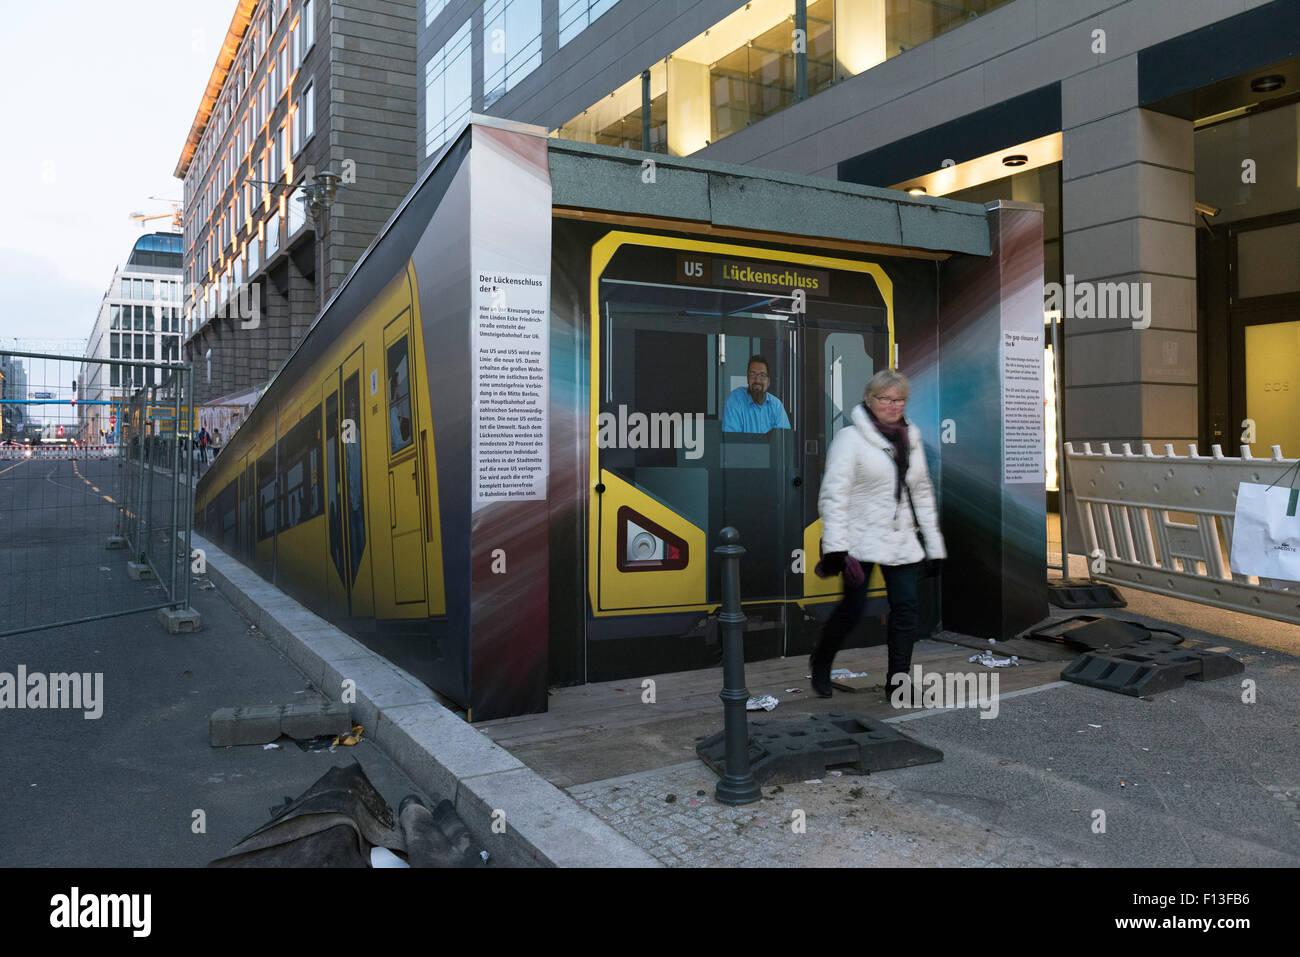 Berlin, Germany, the future output of U5 underground station Unter den Linden - Stock Image